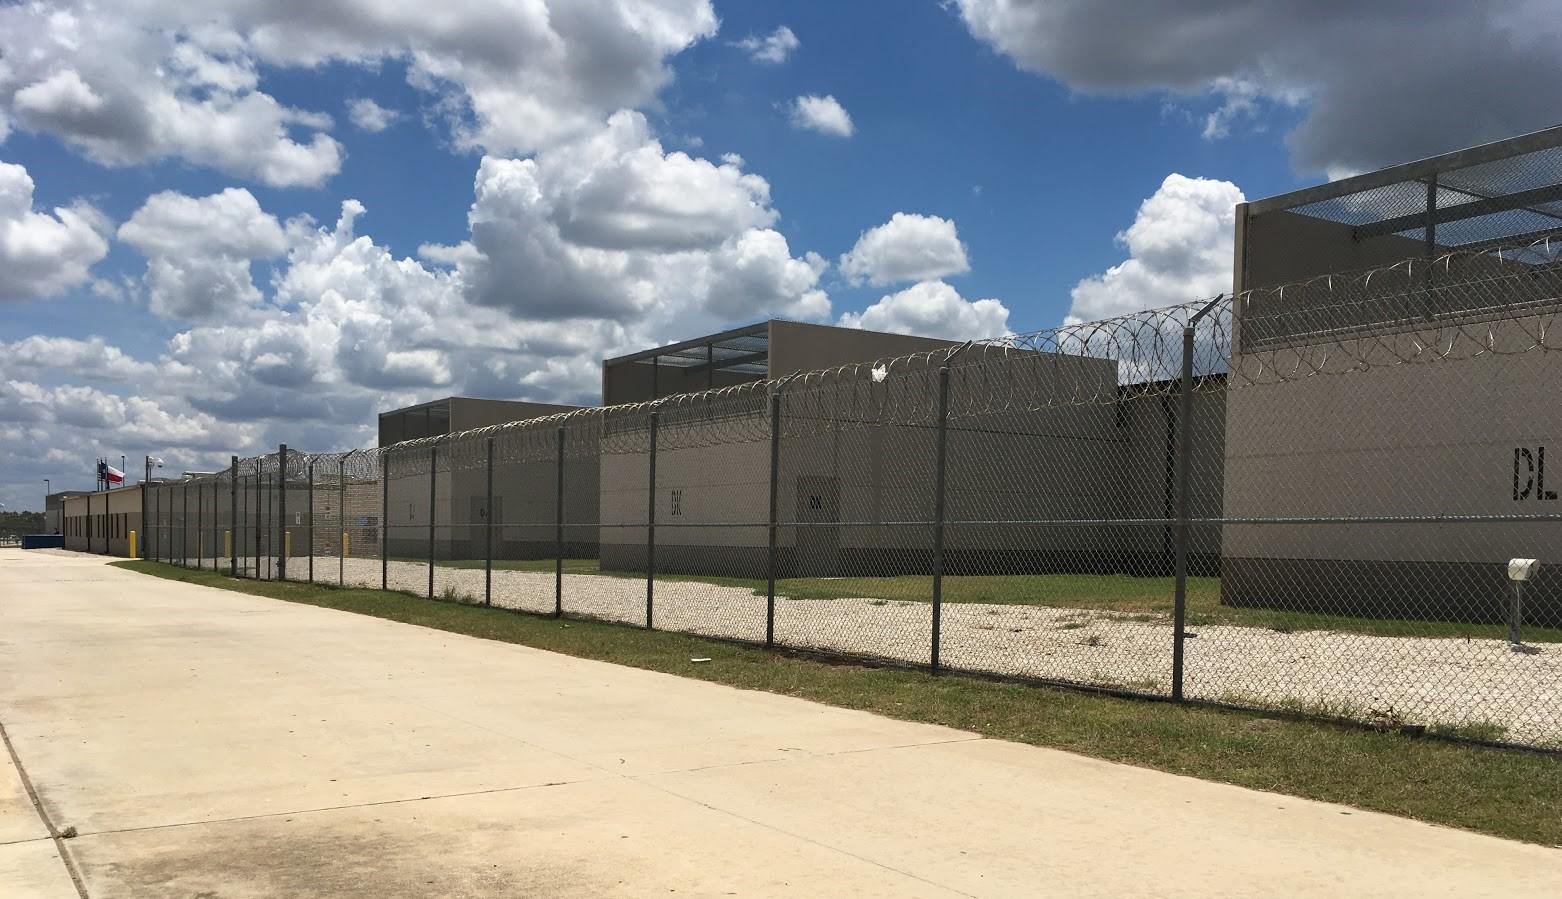 Photo from the US-Mexico border in Laredo, TX